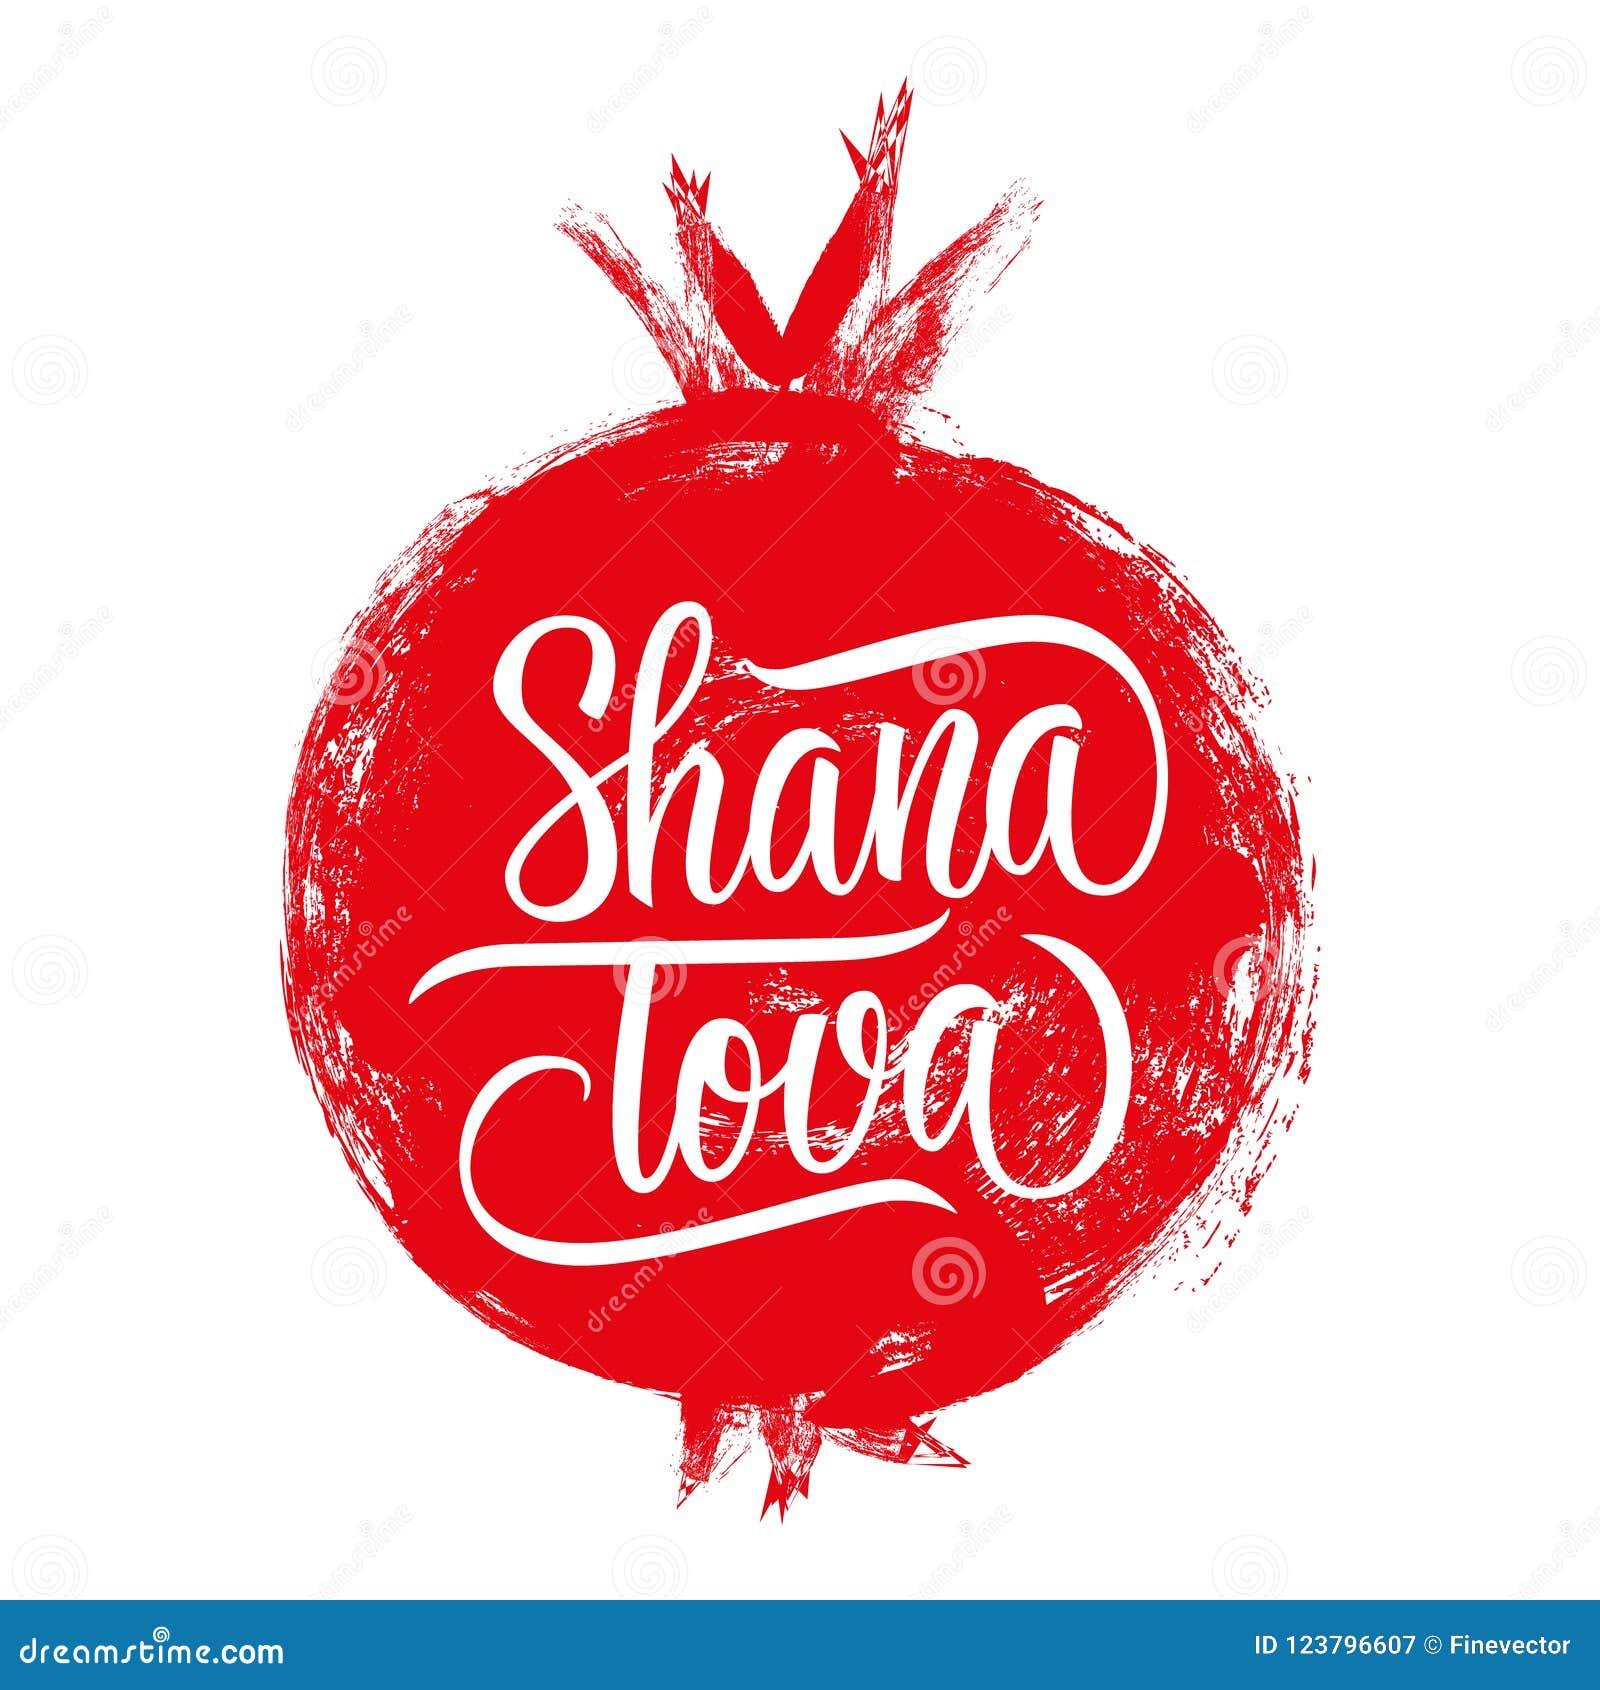 Shana tova hand lettering with brush stroke red pomegranate jewish shana tova hand lettering with brush stroke red pomegranate jewish new year rosh hashanah greeting card phrase translated happy new year m4hsunfo